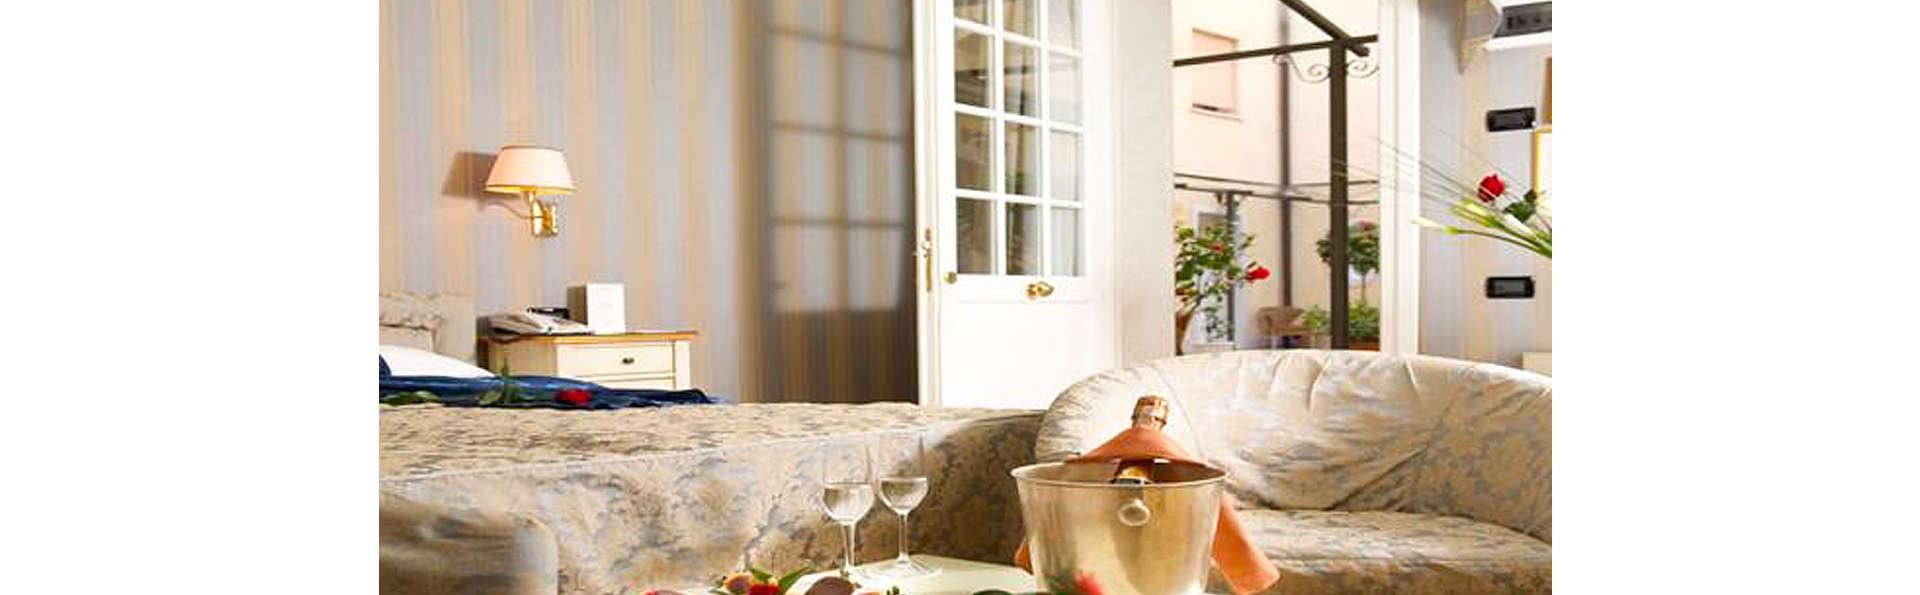 Hotel Carlton on the Grand Canal - EDIT_ROOM_01.jpg